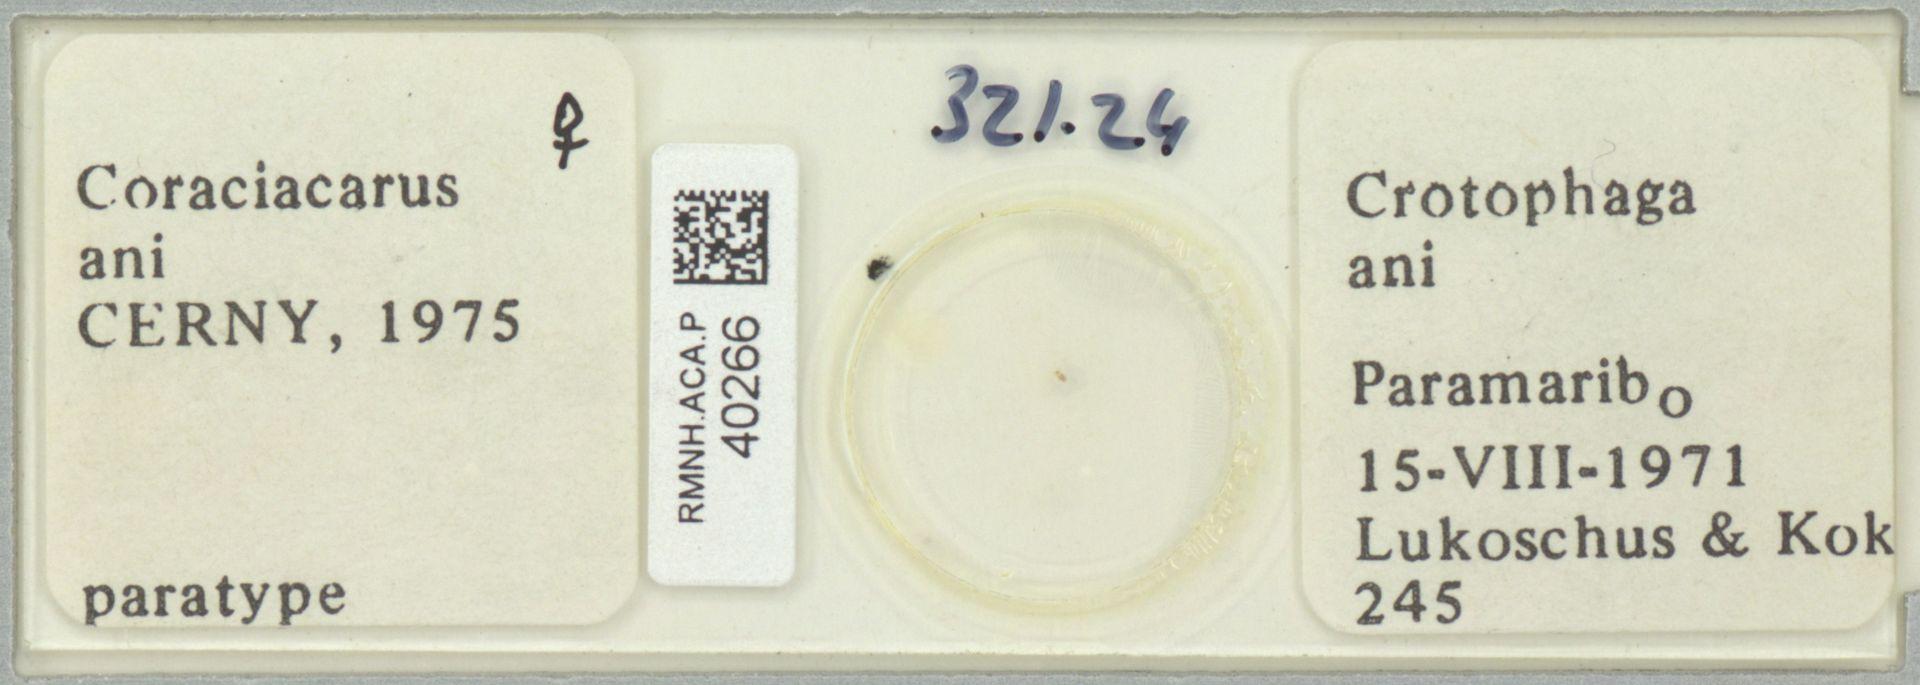 RMNH.ACA.P.40266 | Coraciacarus ani Cerny, 1975